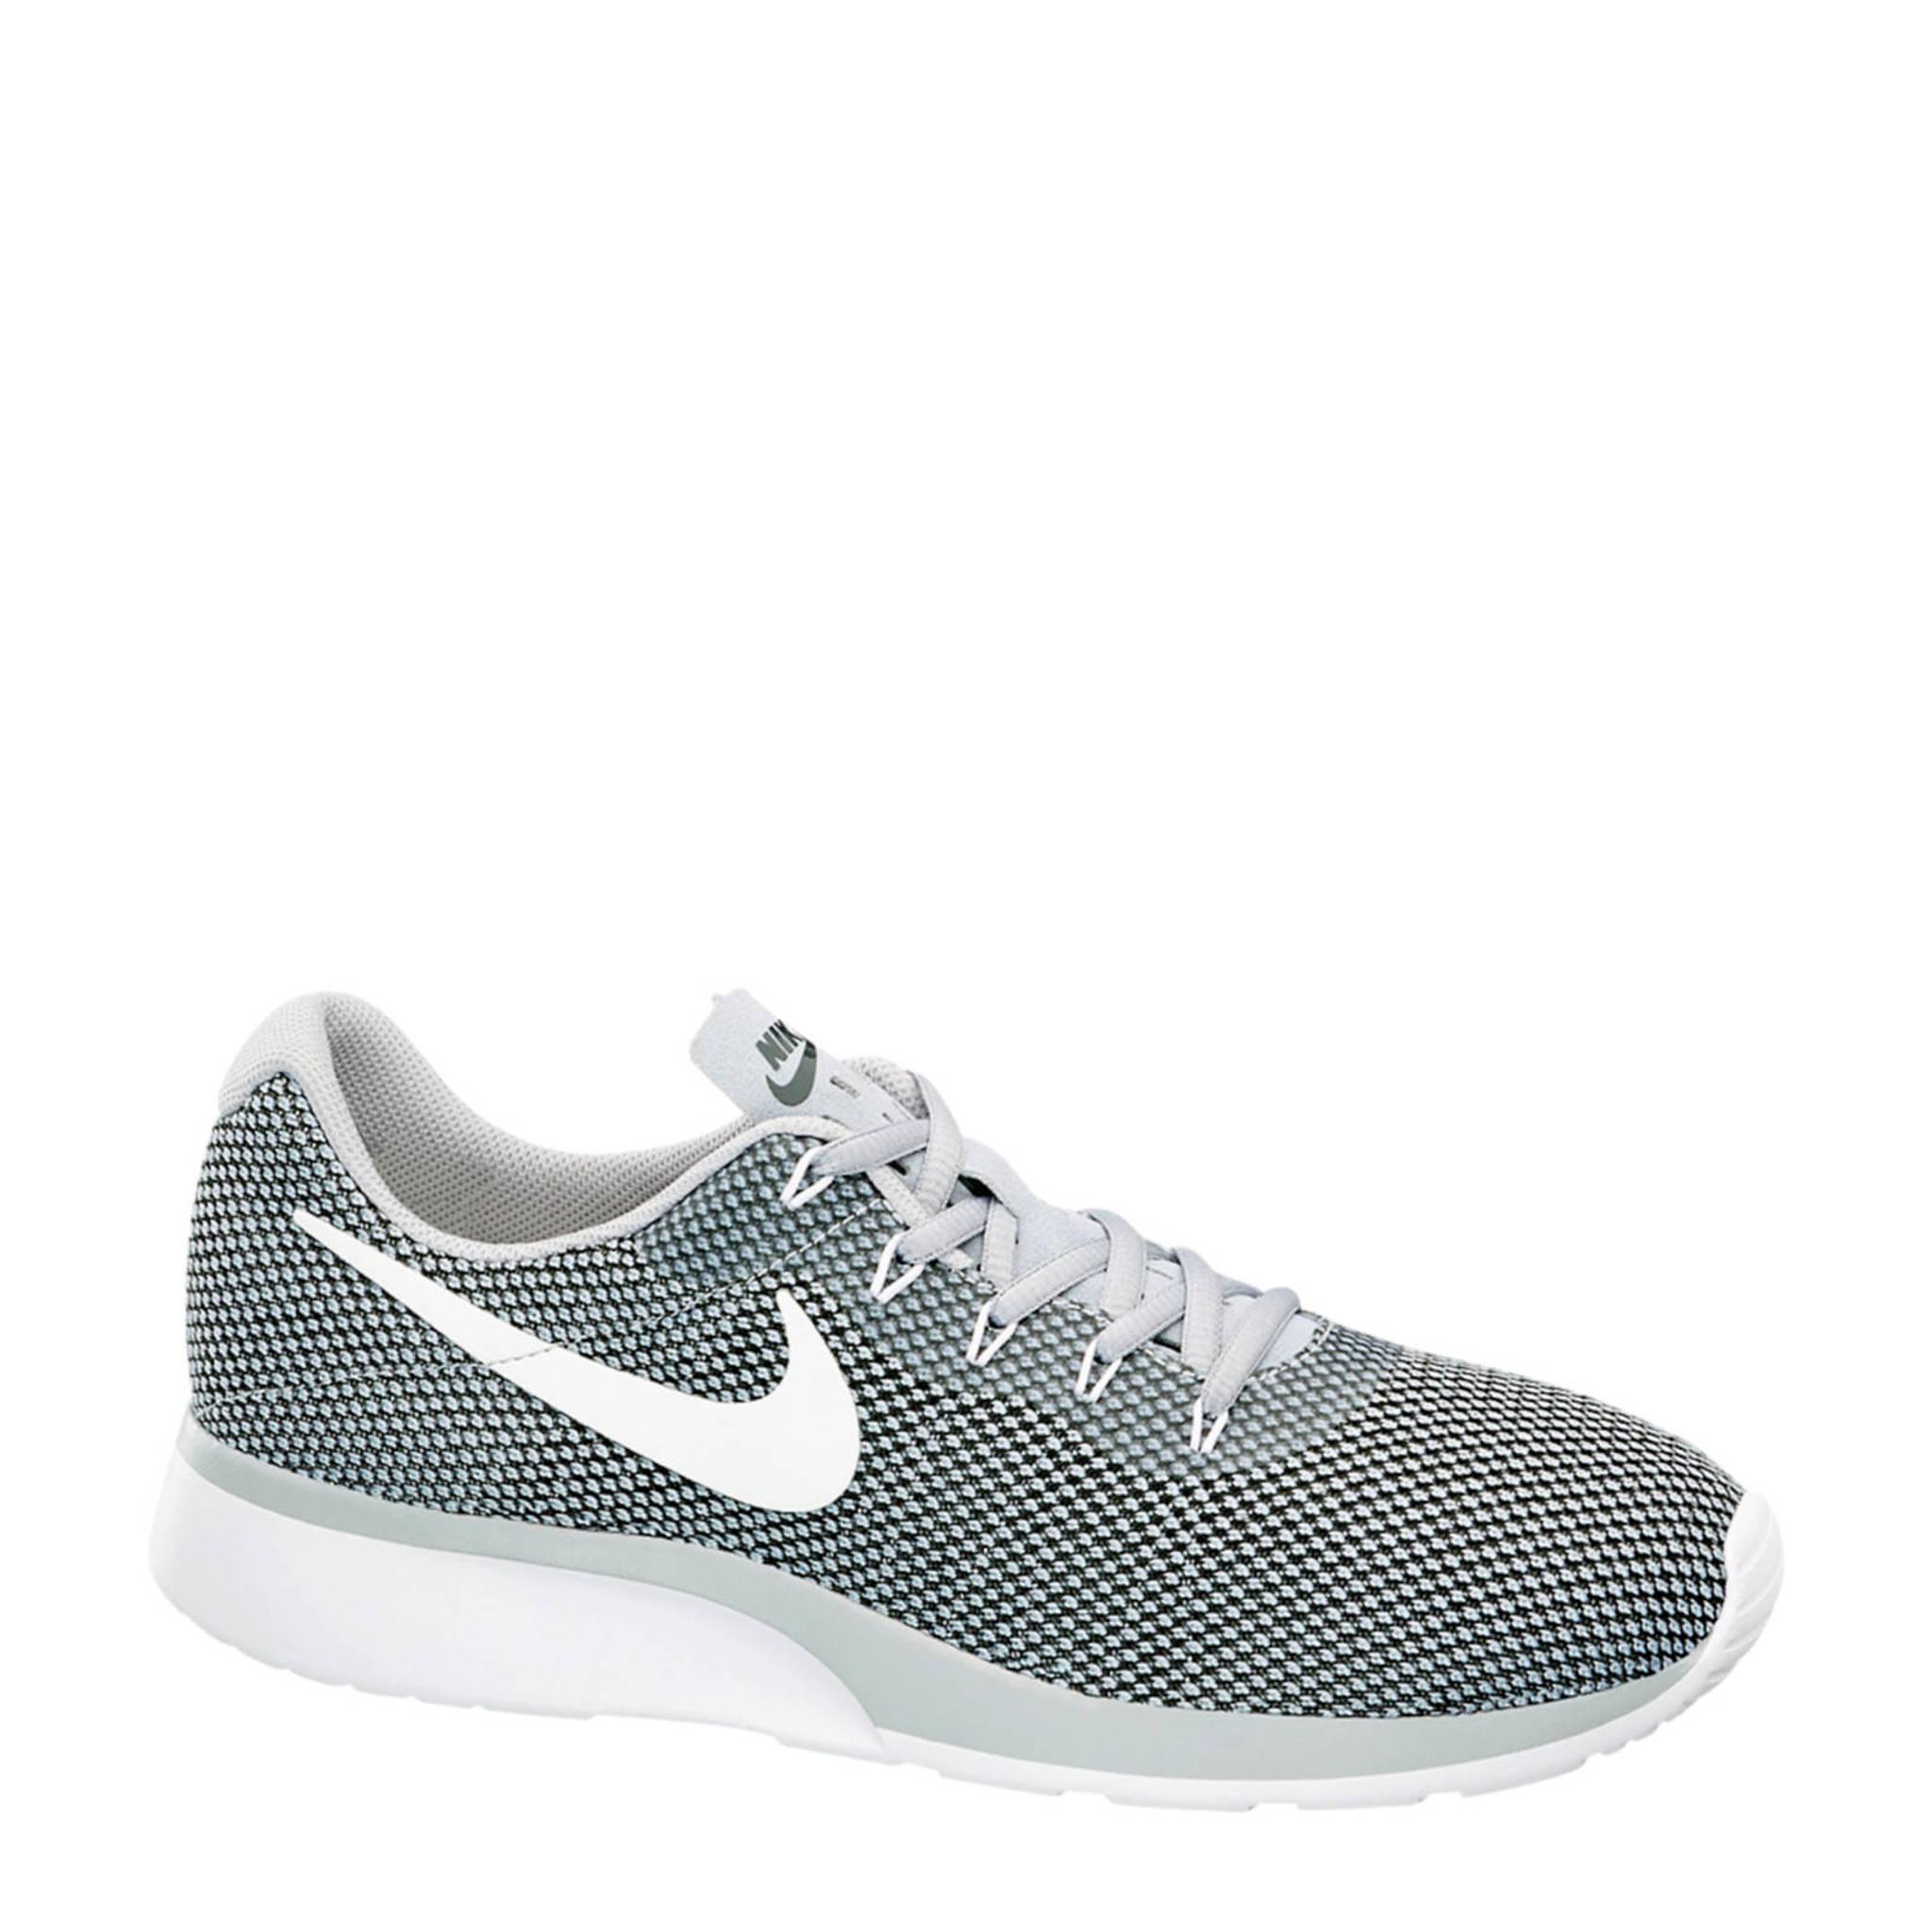 22a2913c8da Nike Tanjun Racer sneakers   wehkamp